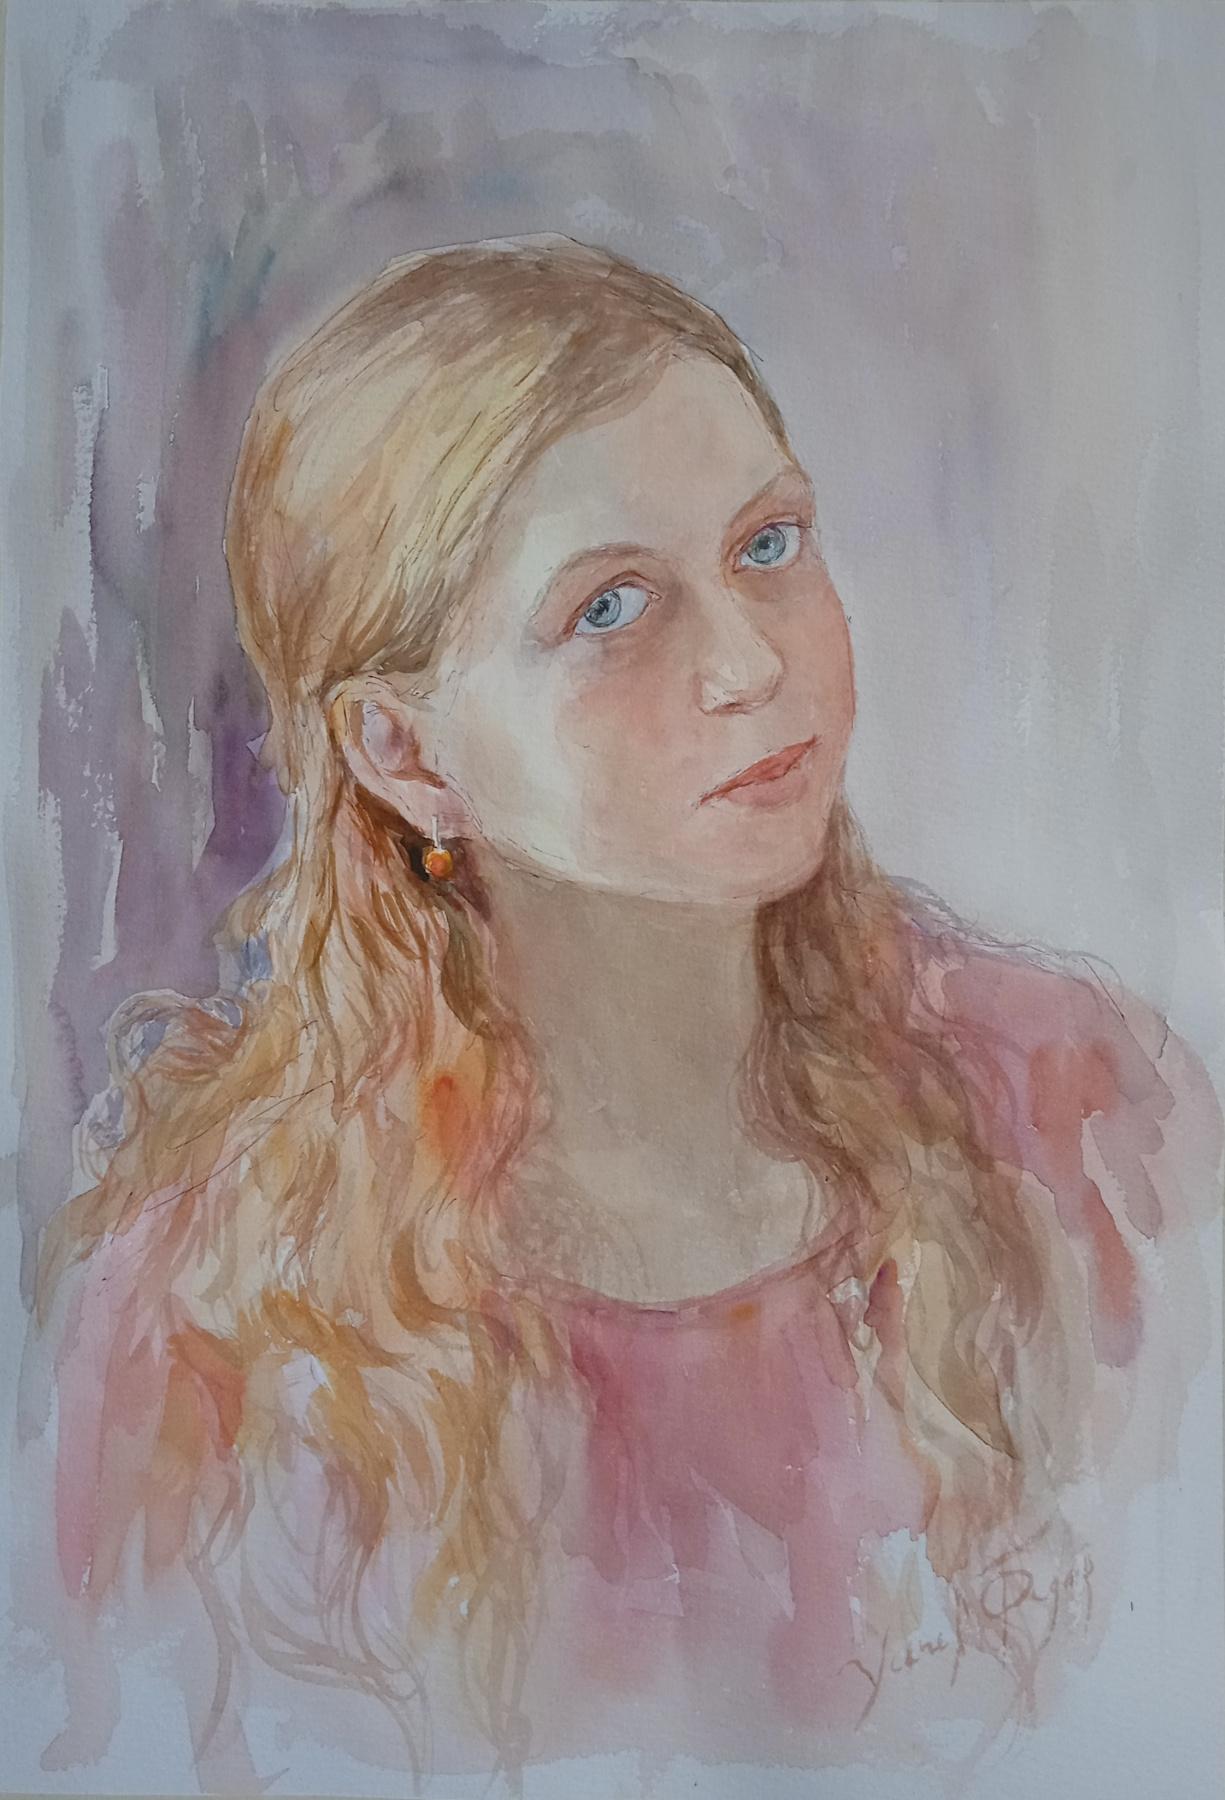 Fedor Dmitrievich Usachev. Crystal eyes.